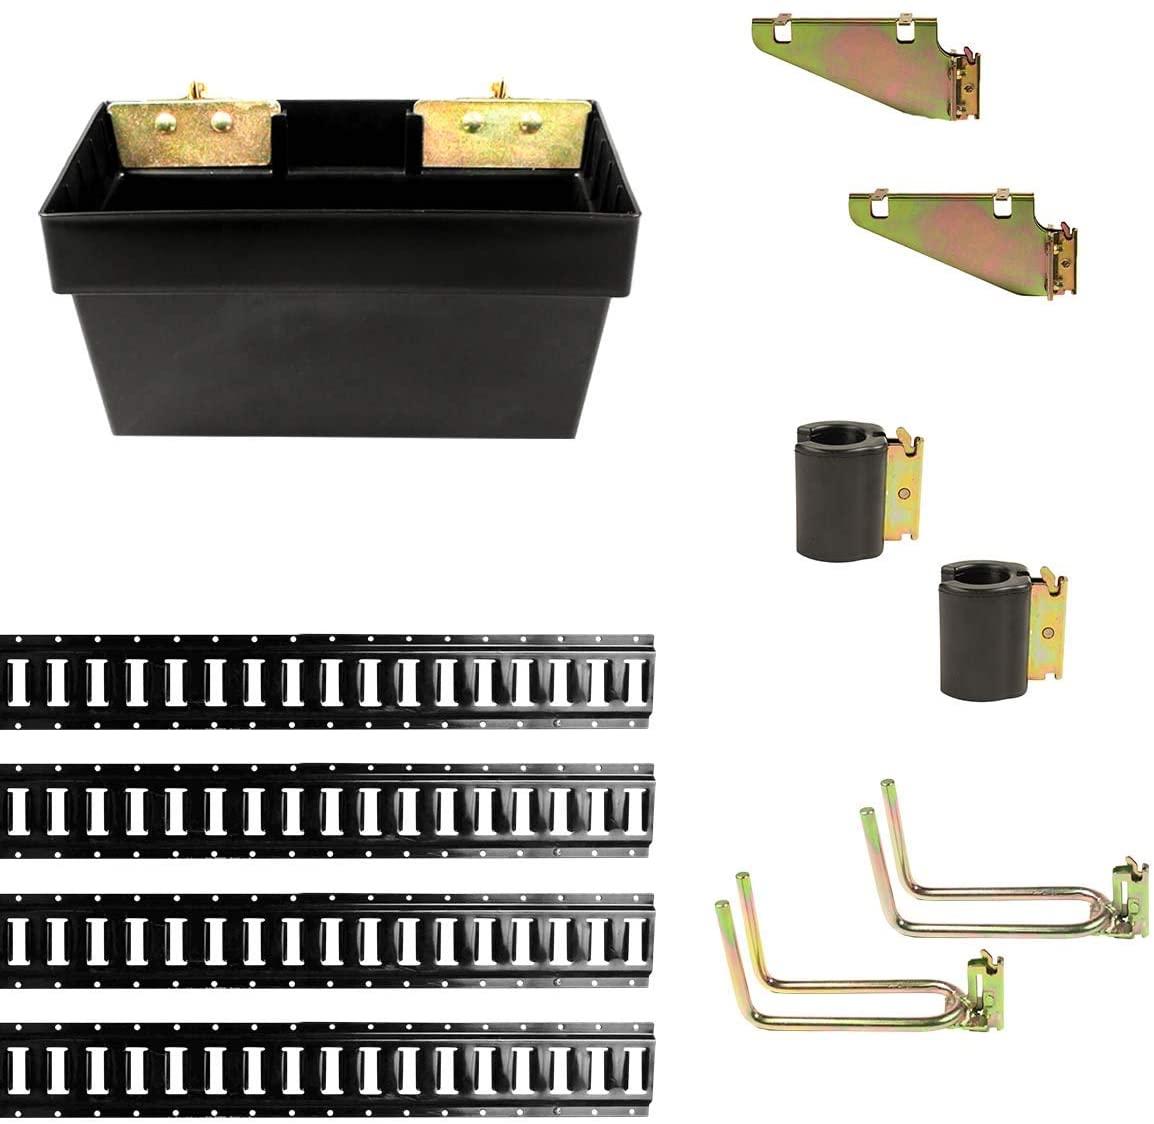 DC Cargo Mall E Track Organization Kit - 11 Pieces: 5 ft Black E Track Rails & E Track Organization Accessories